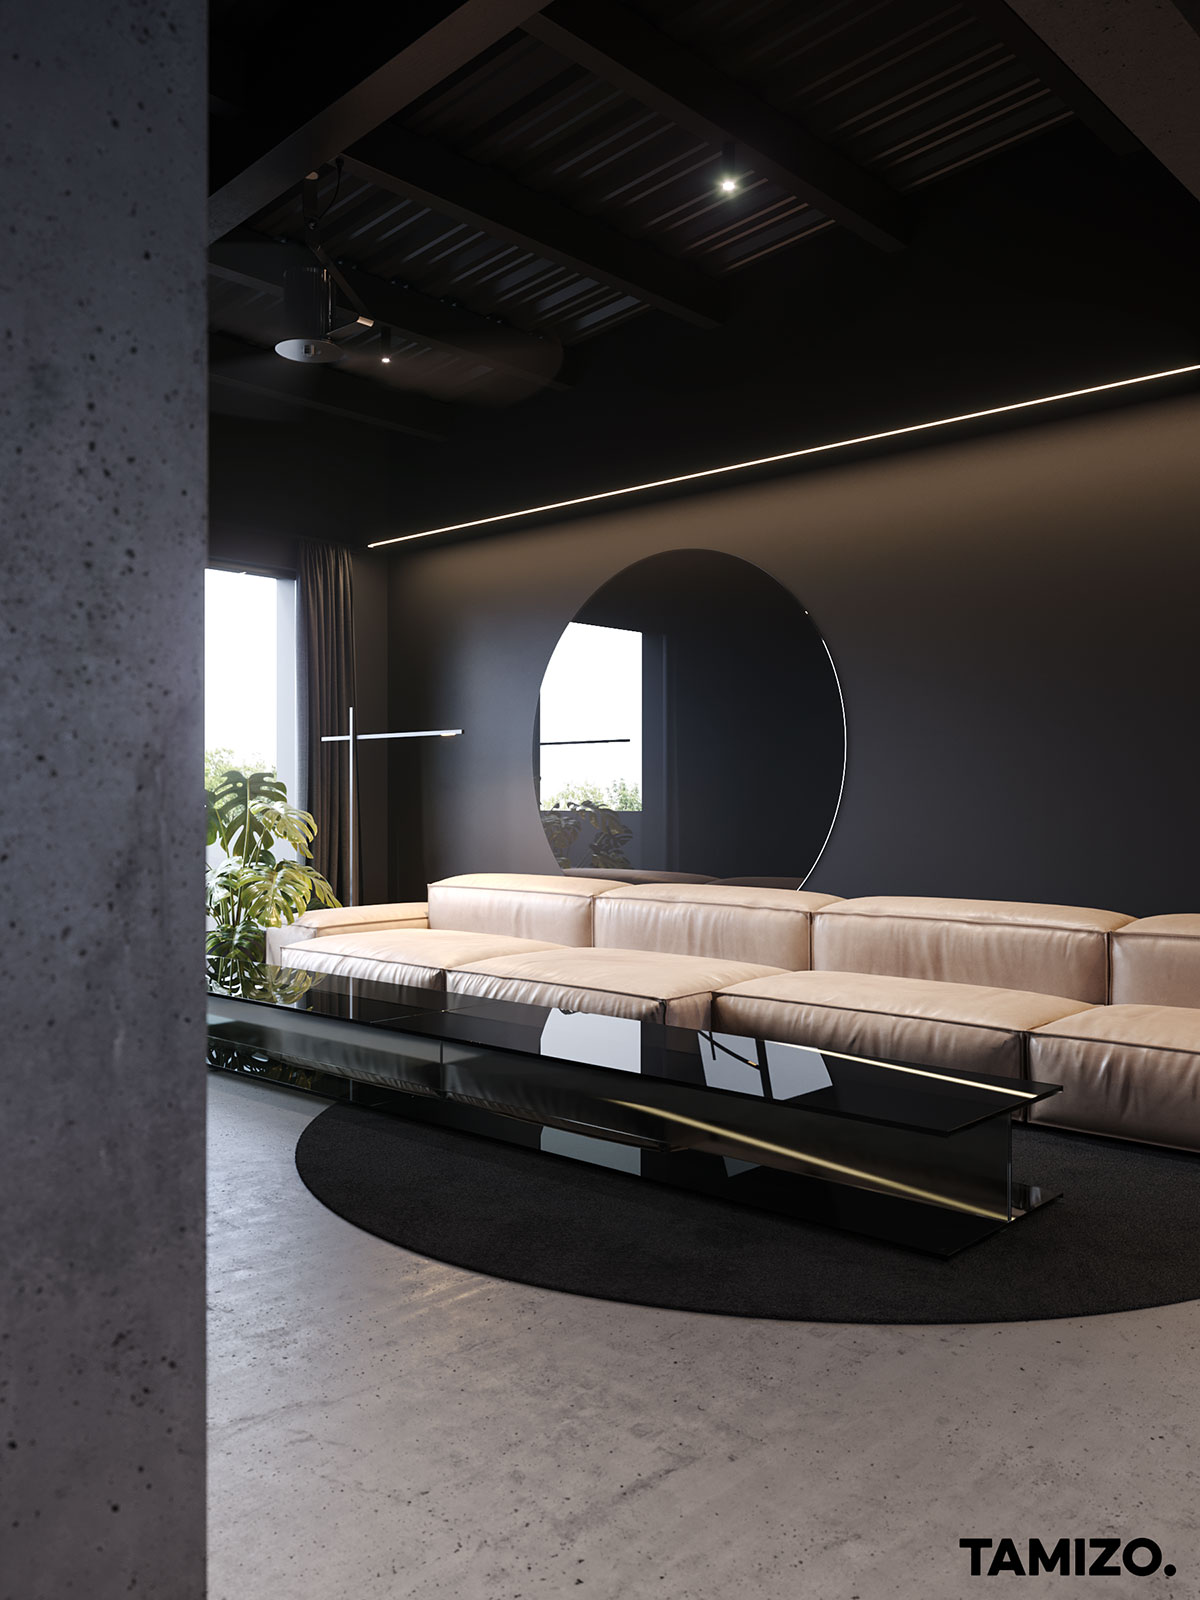 tamizo_architects_mateusz_kuo_stolarski_poznan_iterior_design_apartment_penthouse_03